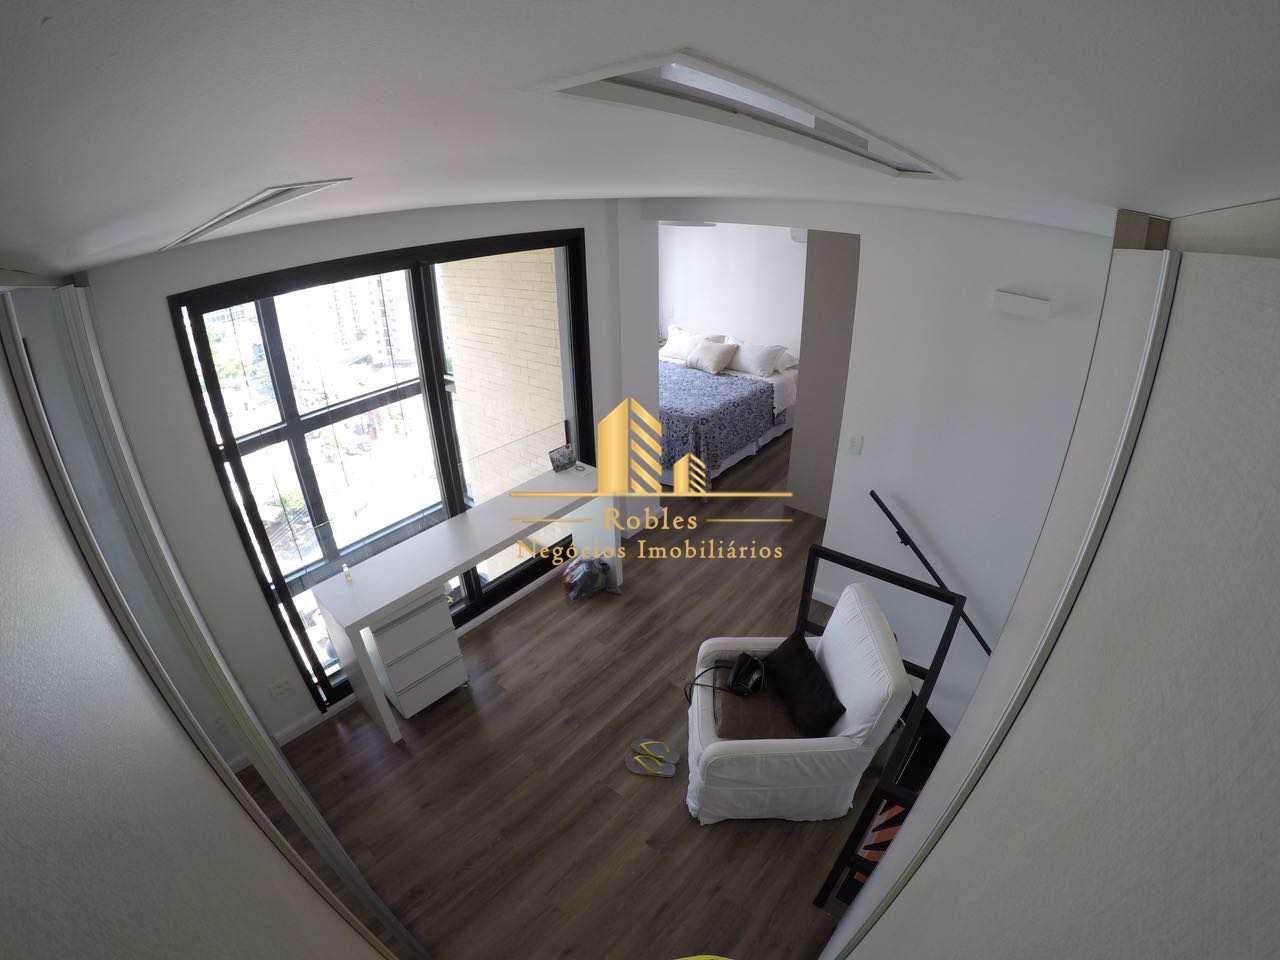 Apartamento com 1 dorm, Vila Olímpia, São Paulo - R$ 1.09 mi, Cod: 404